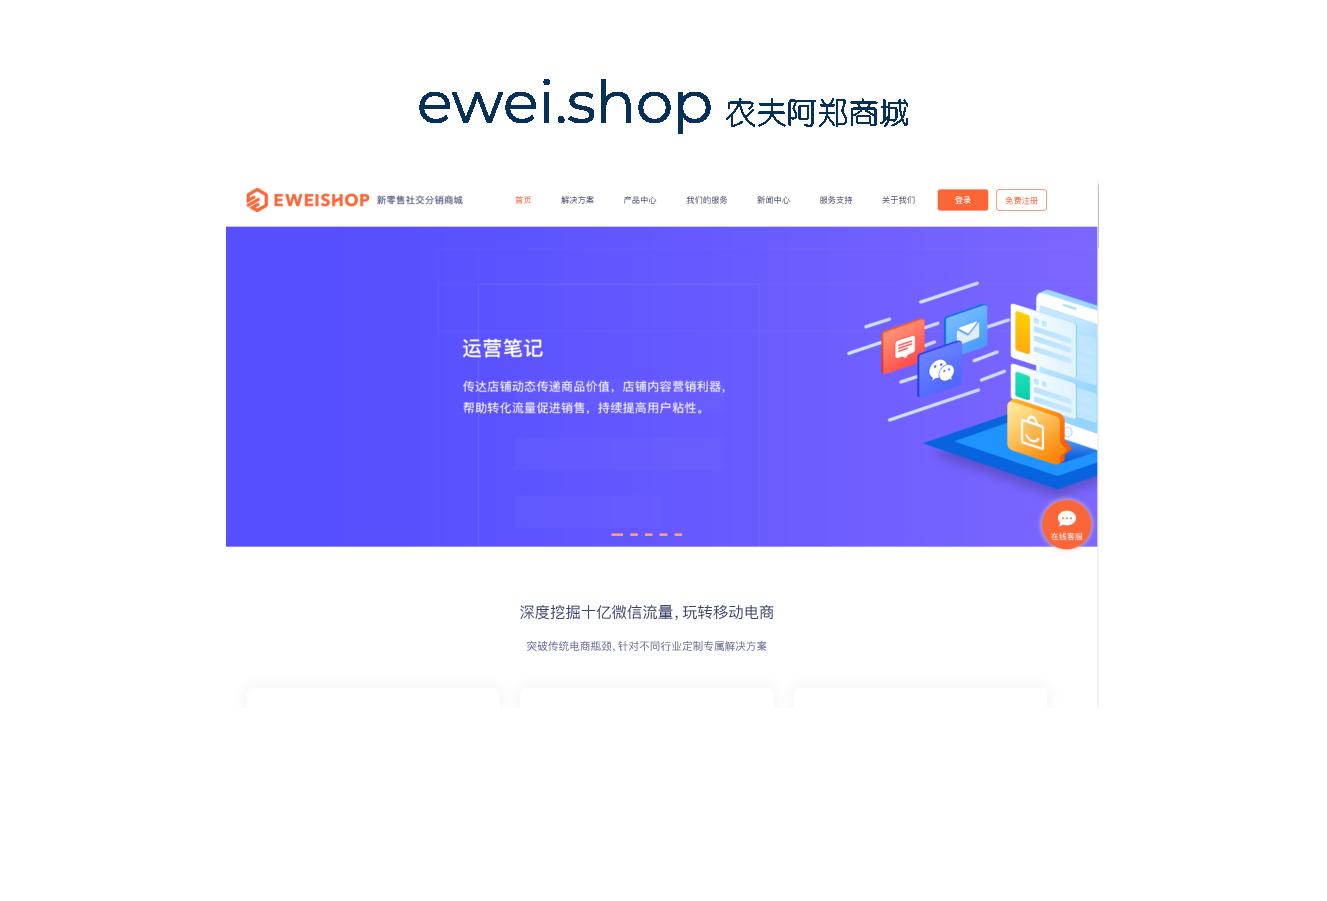 ewei.shop